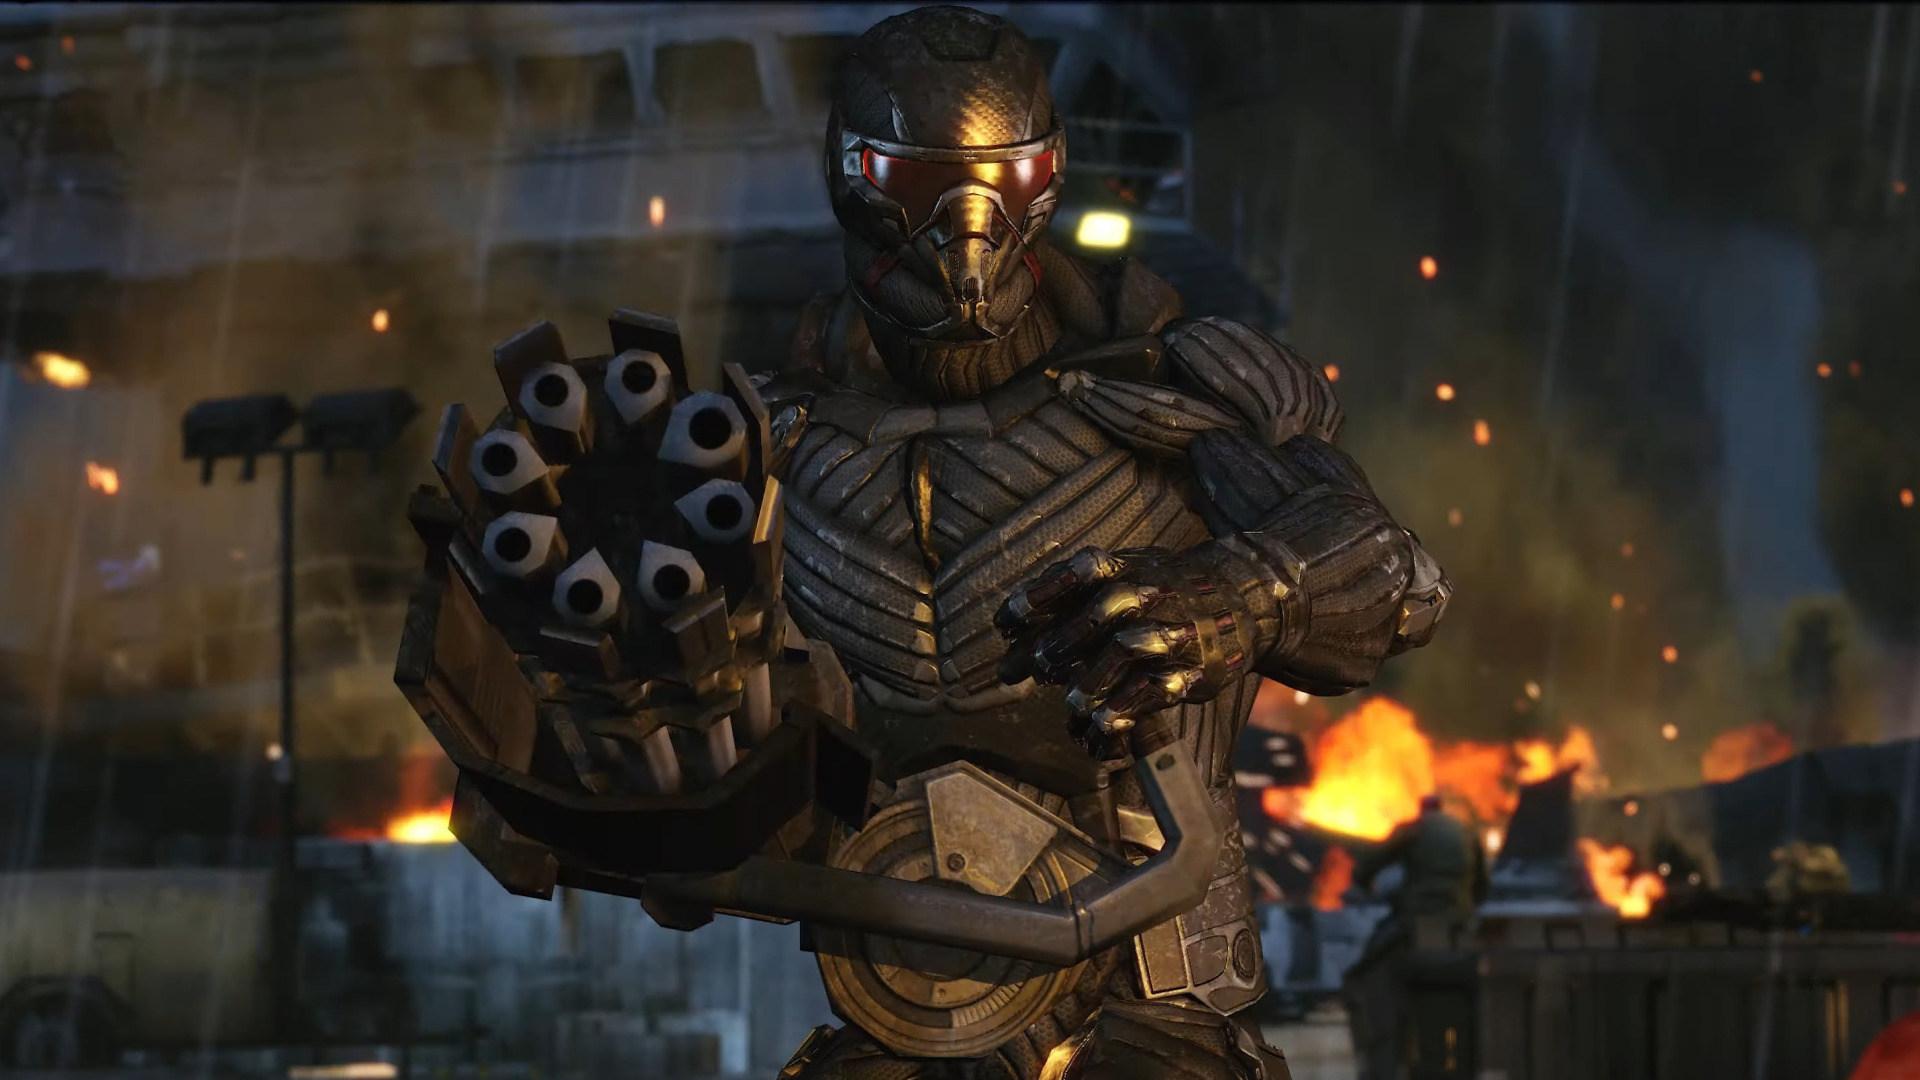 Trailer, Ego-Shooter, Shooter, Crytek, Crysis, Crysis Remastered